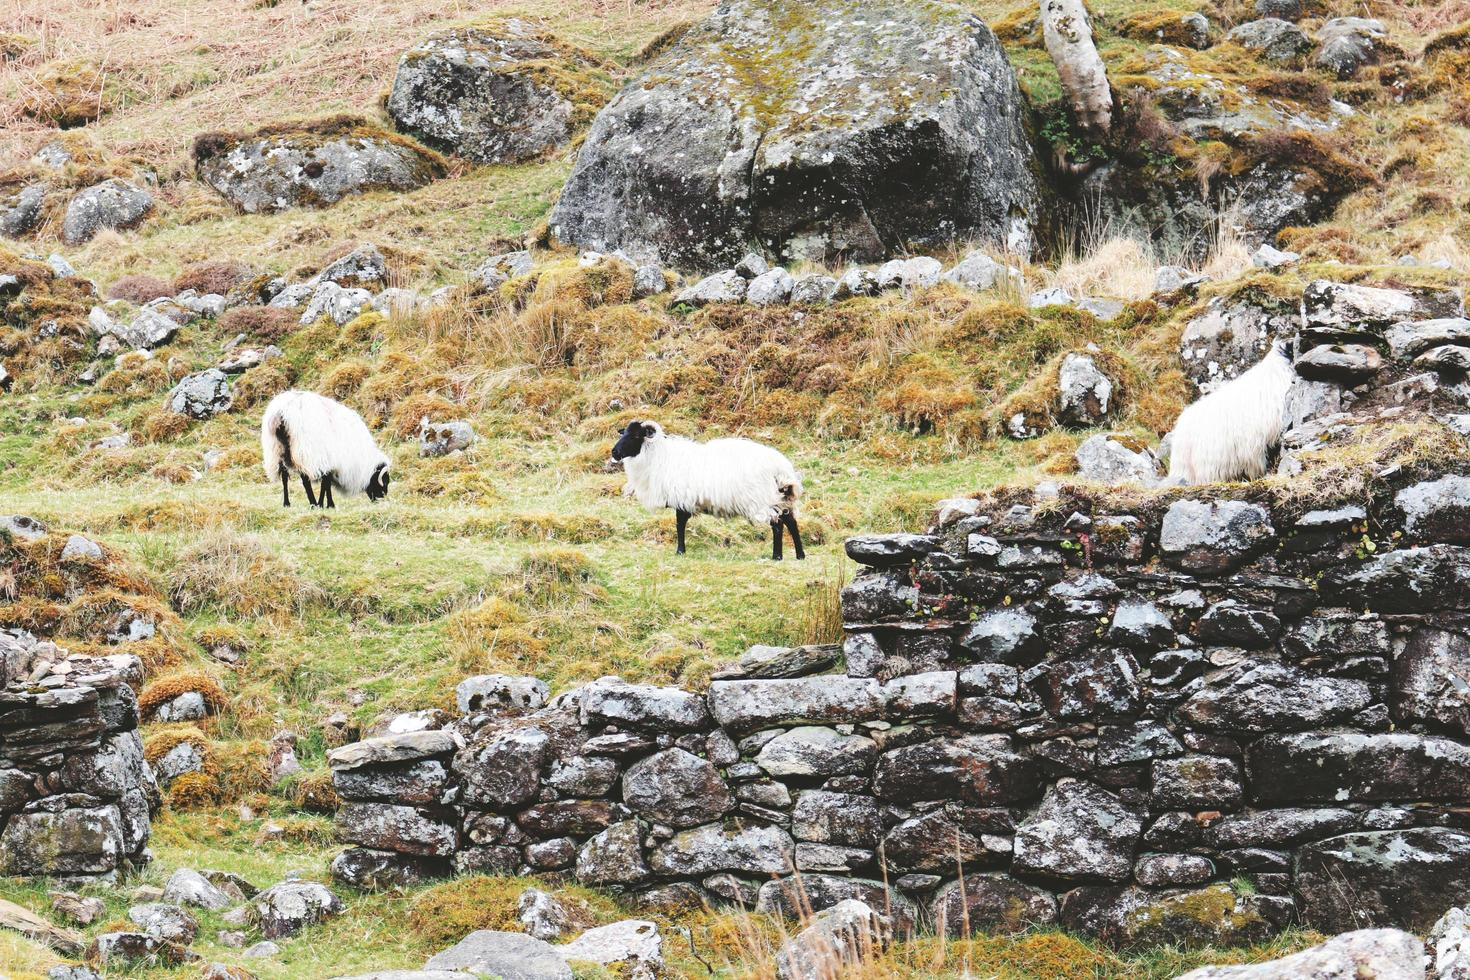 Tres ovejas blancas de pie cerca de rocas marrones foto